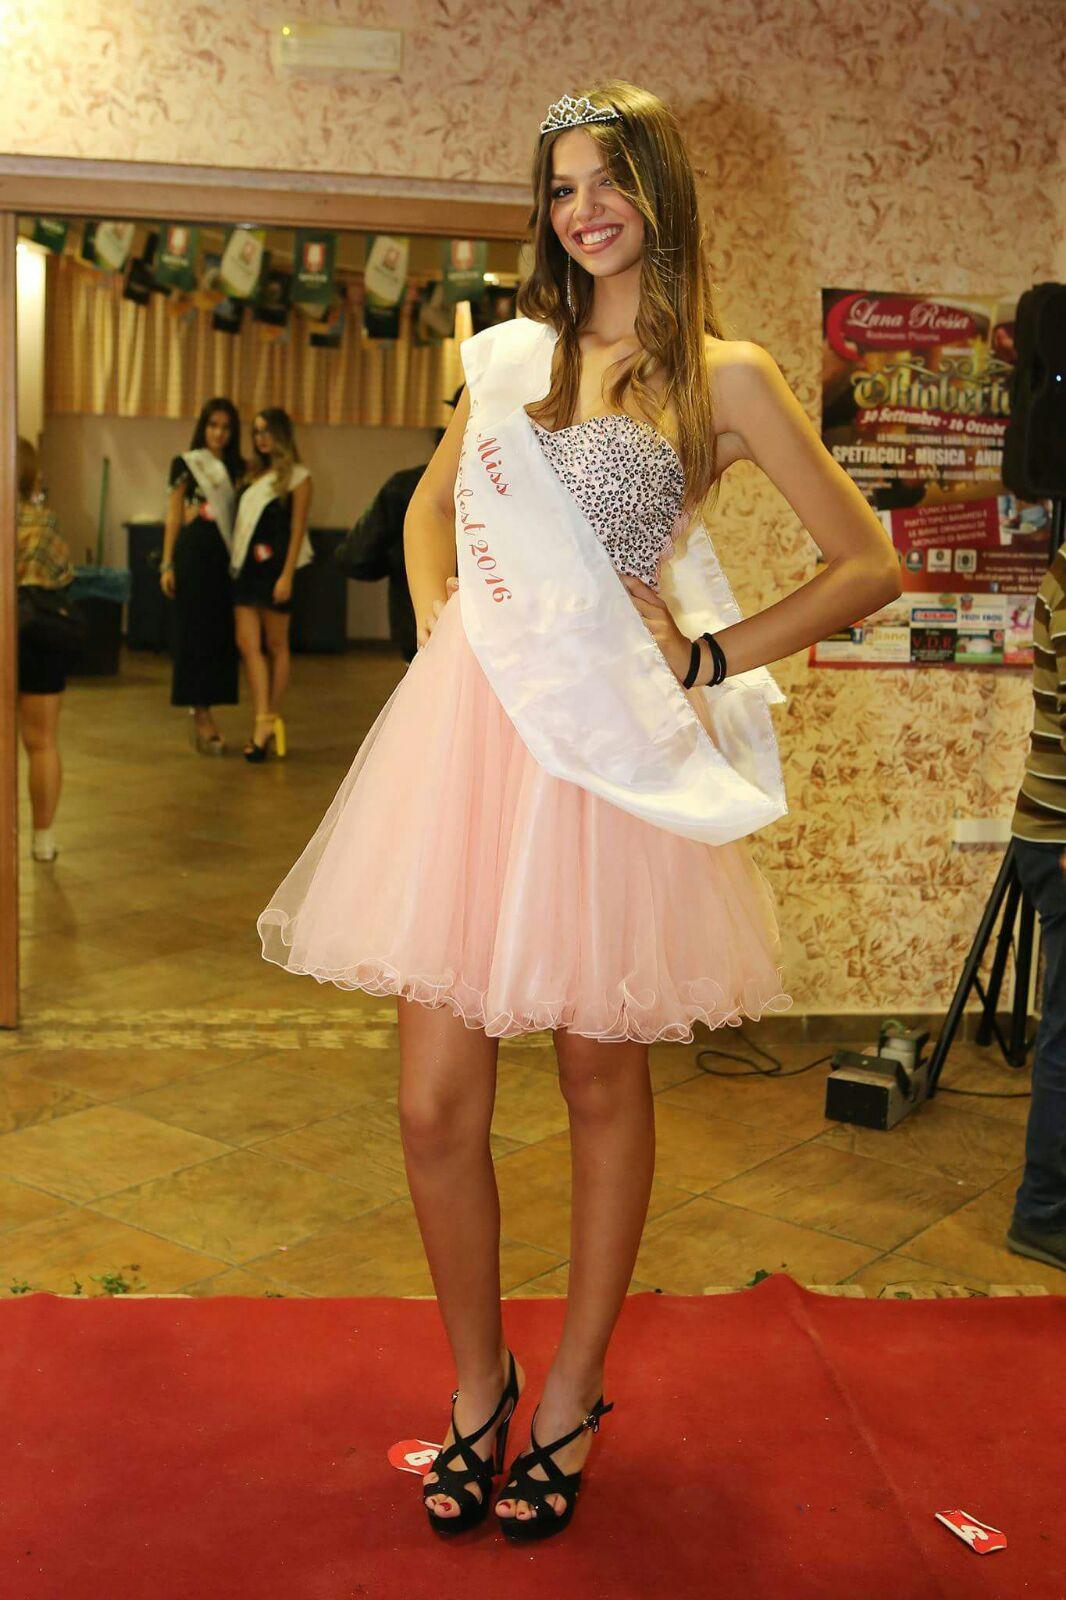 Erica L.-Miss OctoberFest